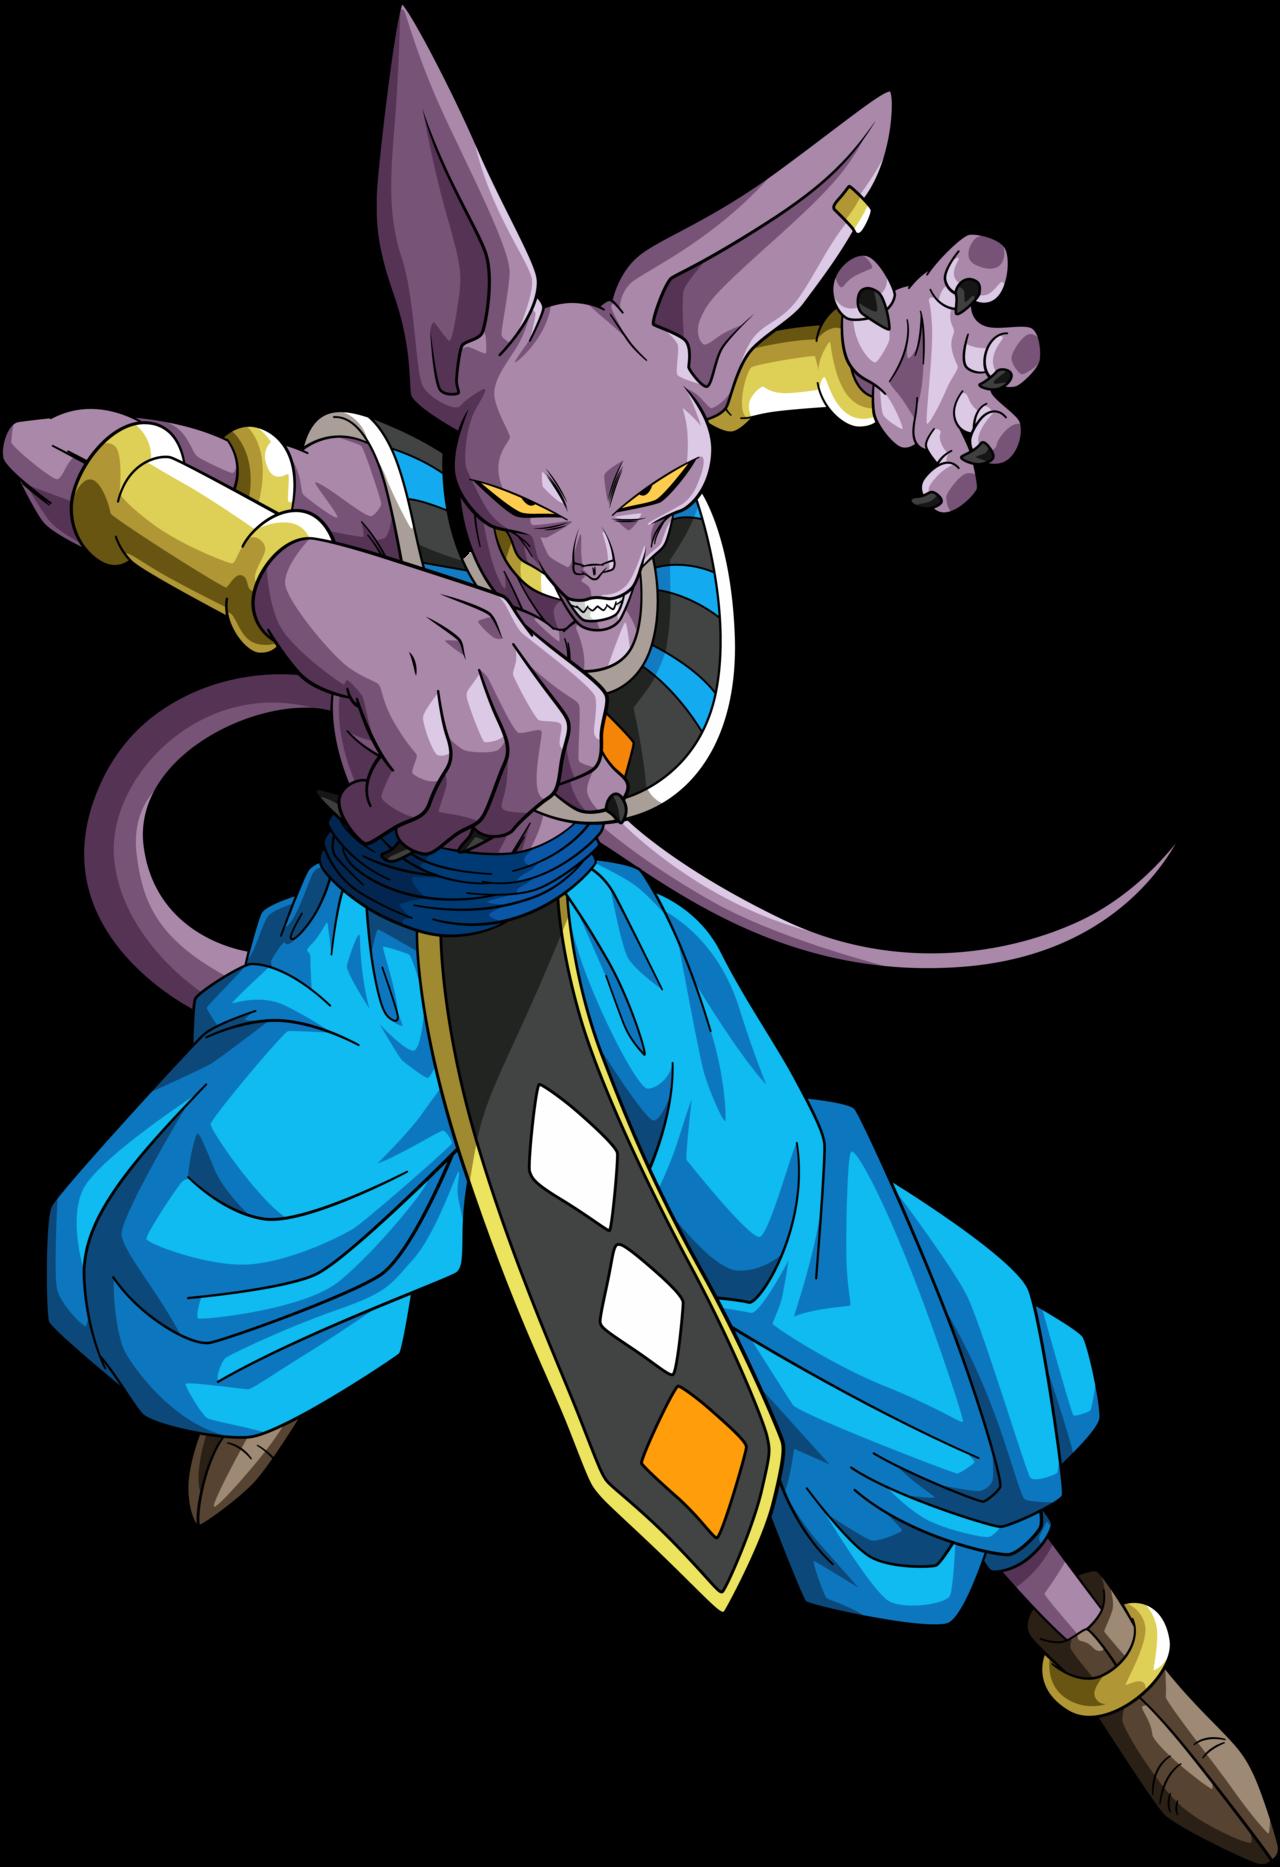 Hit Imagens Do Goku E Bills Transparent Png Download